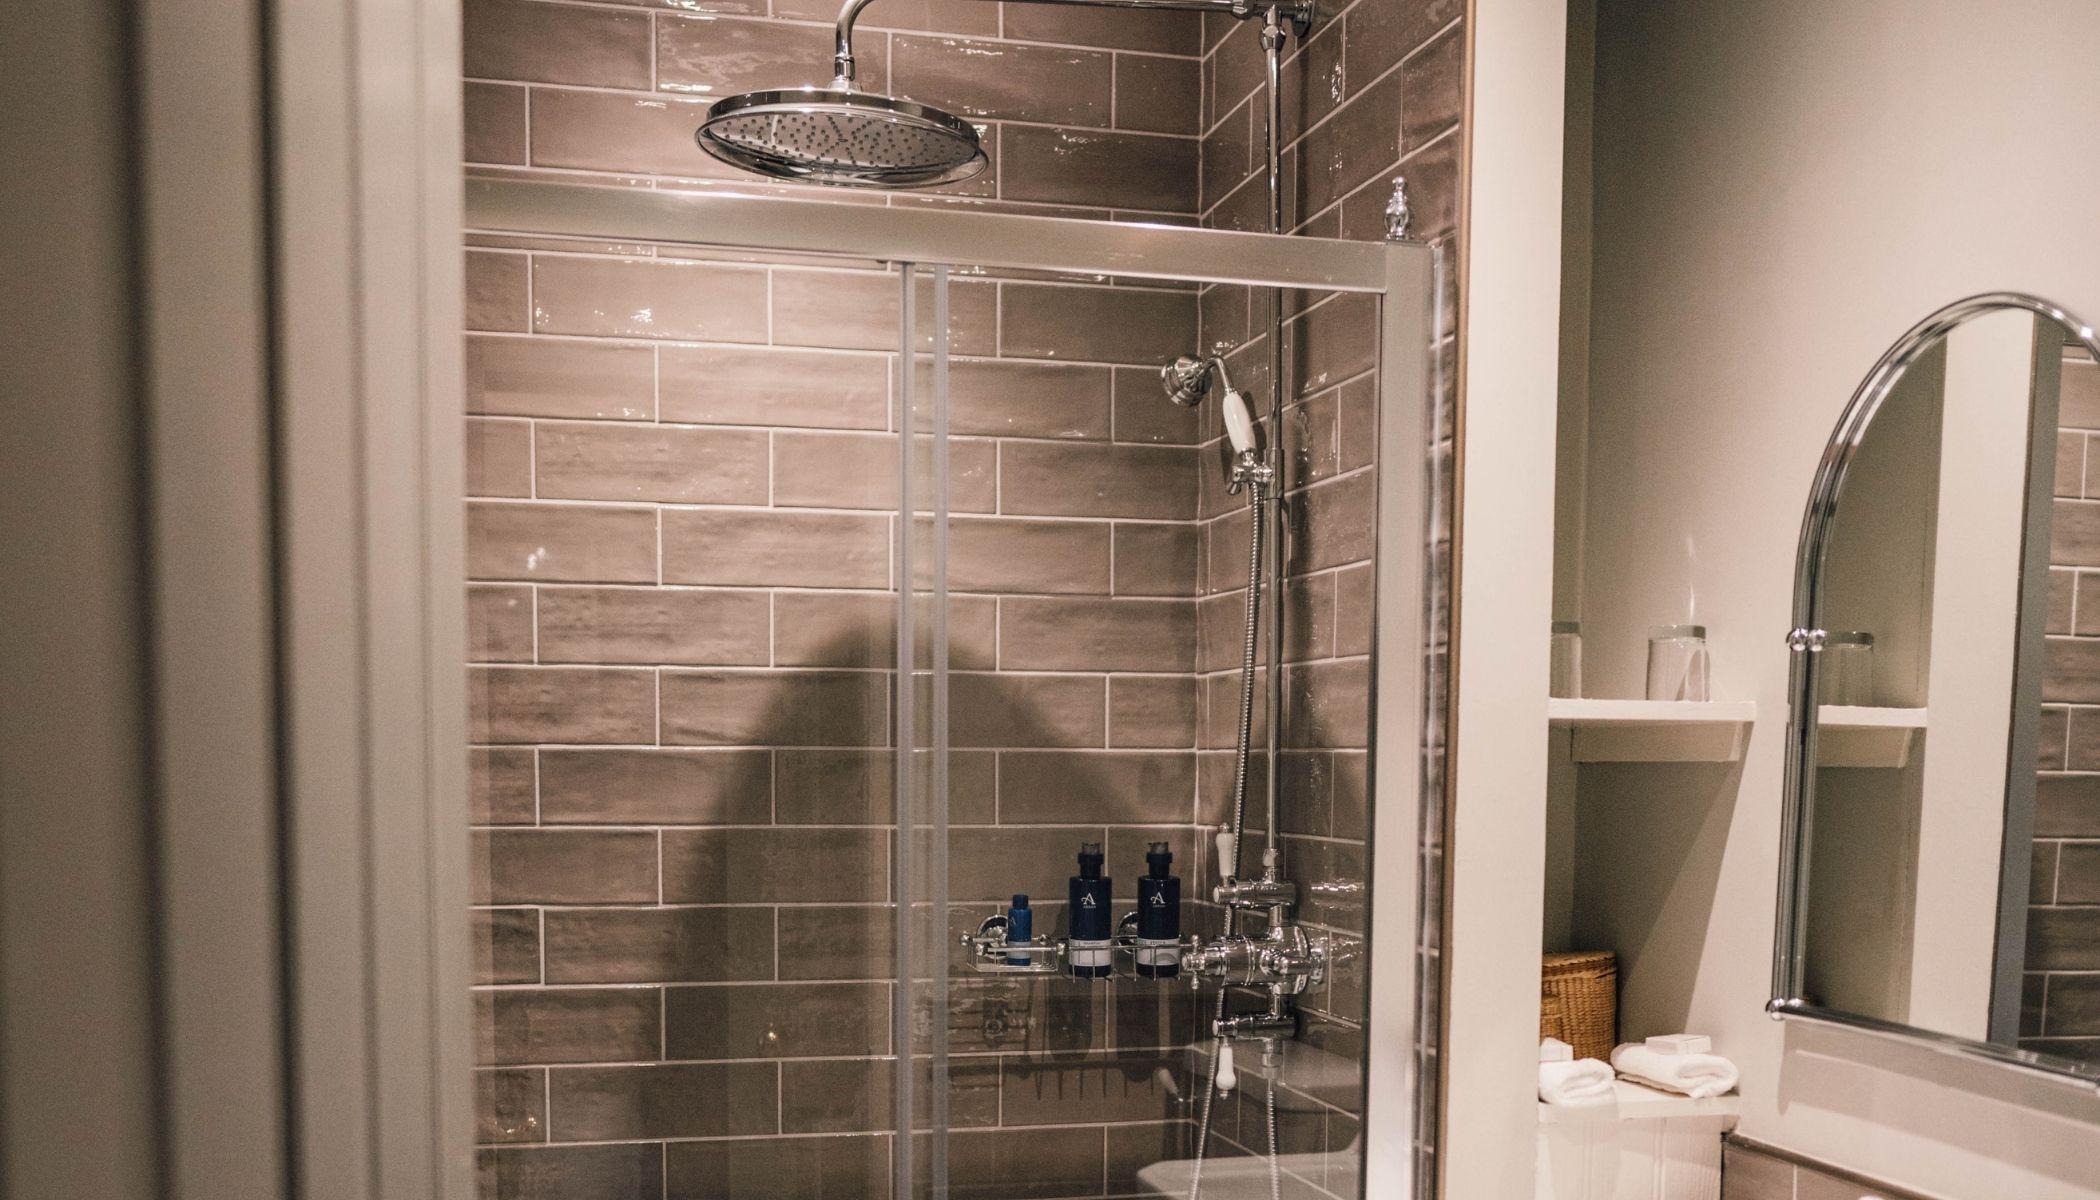 Shurrey - Shower Only